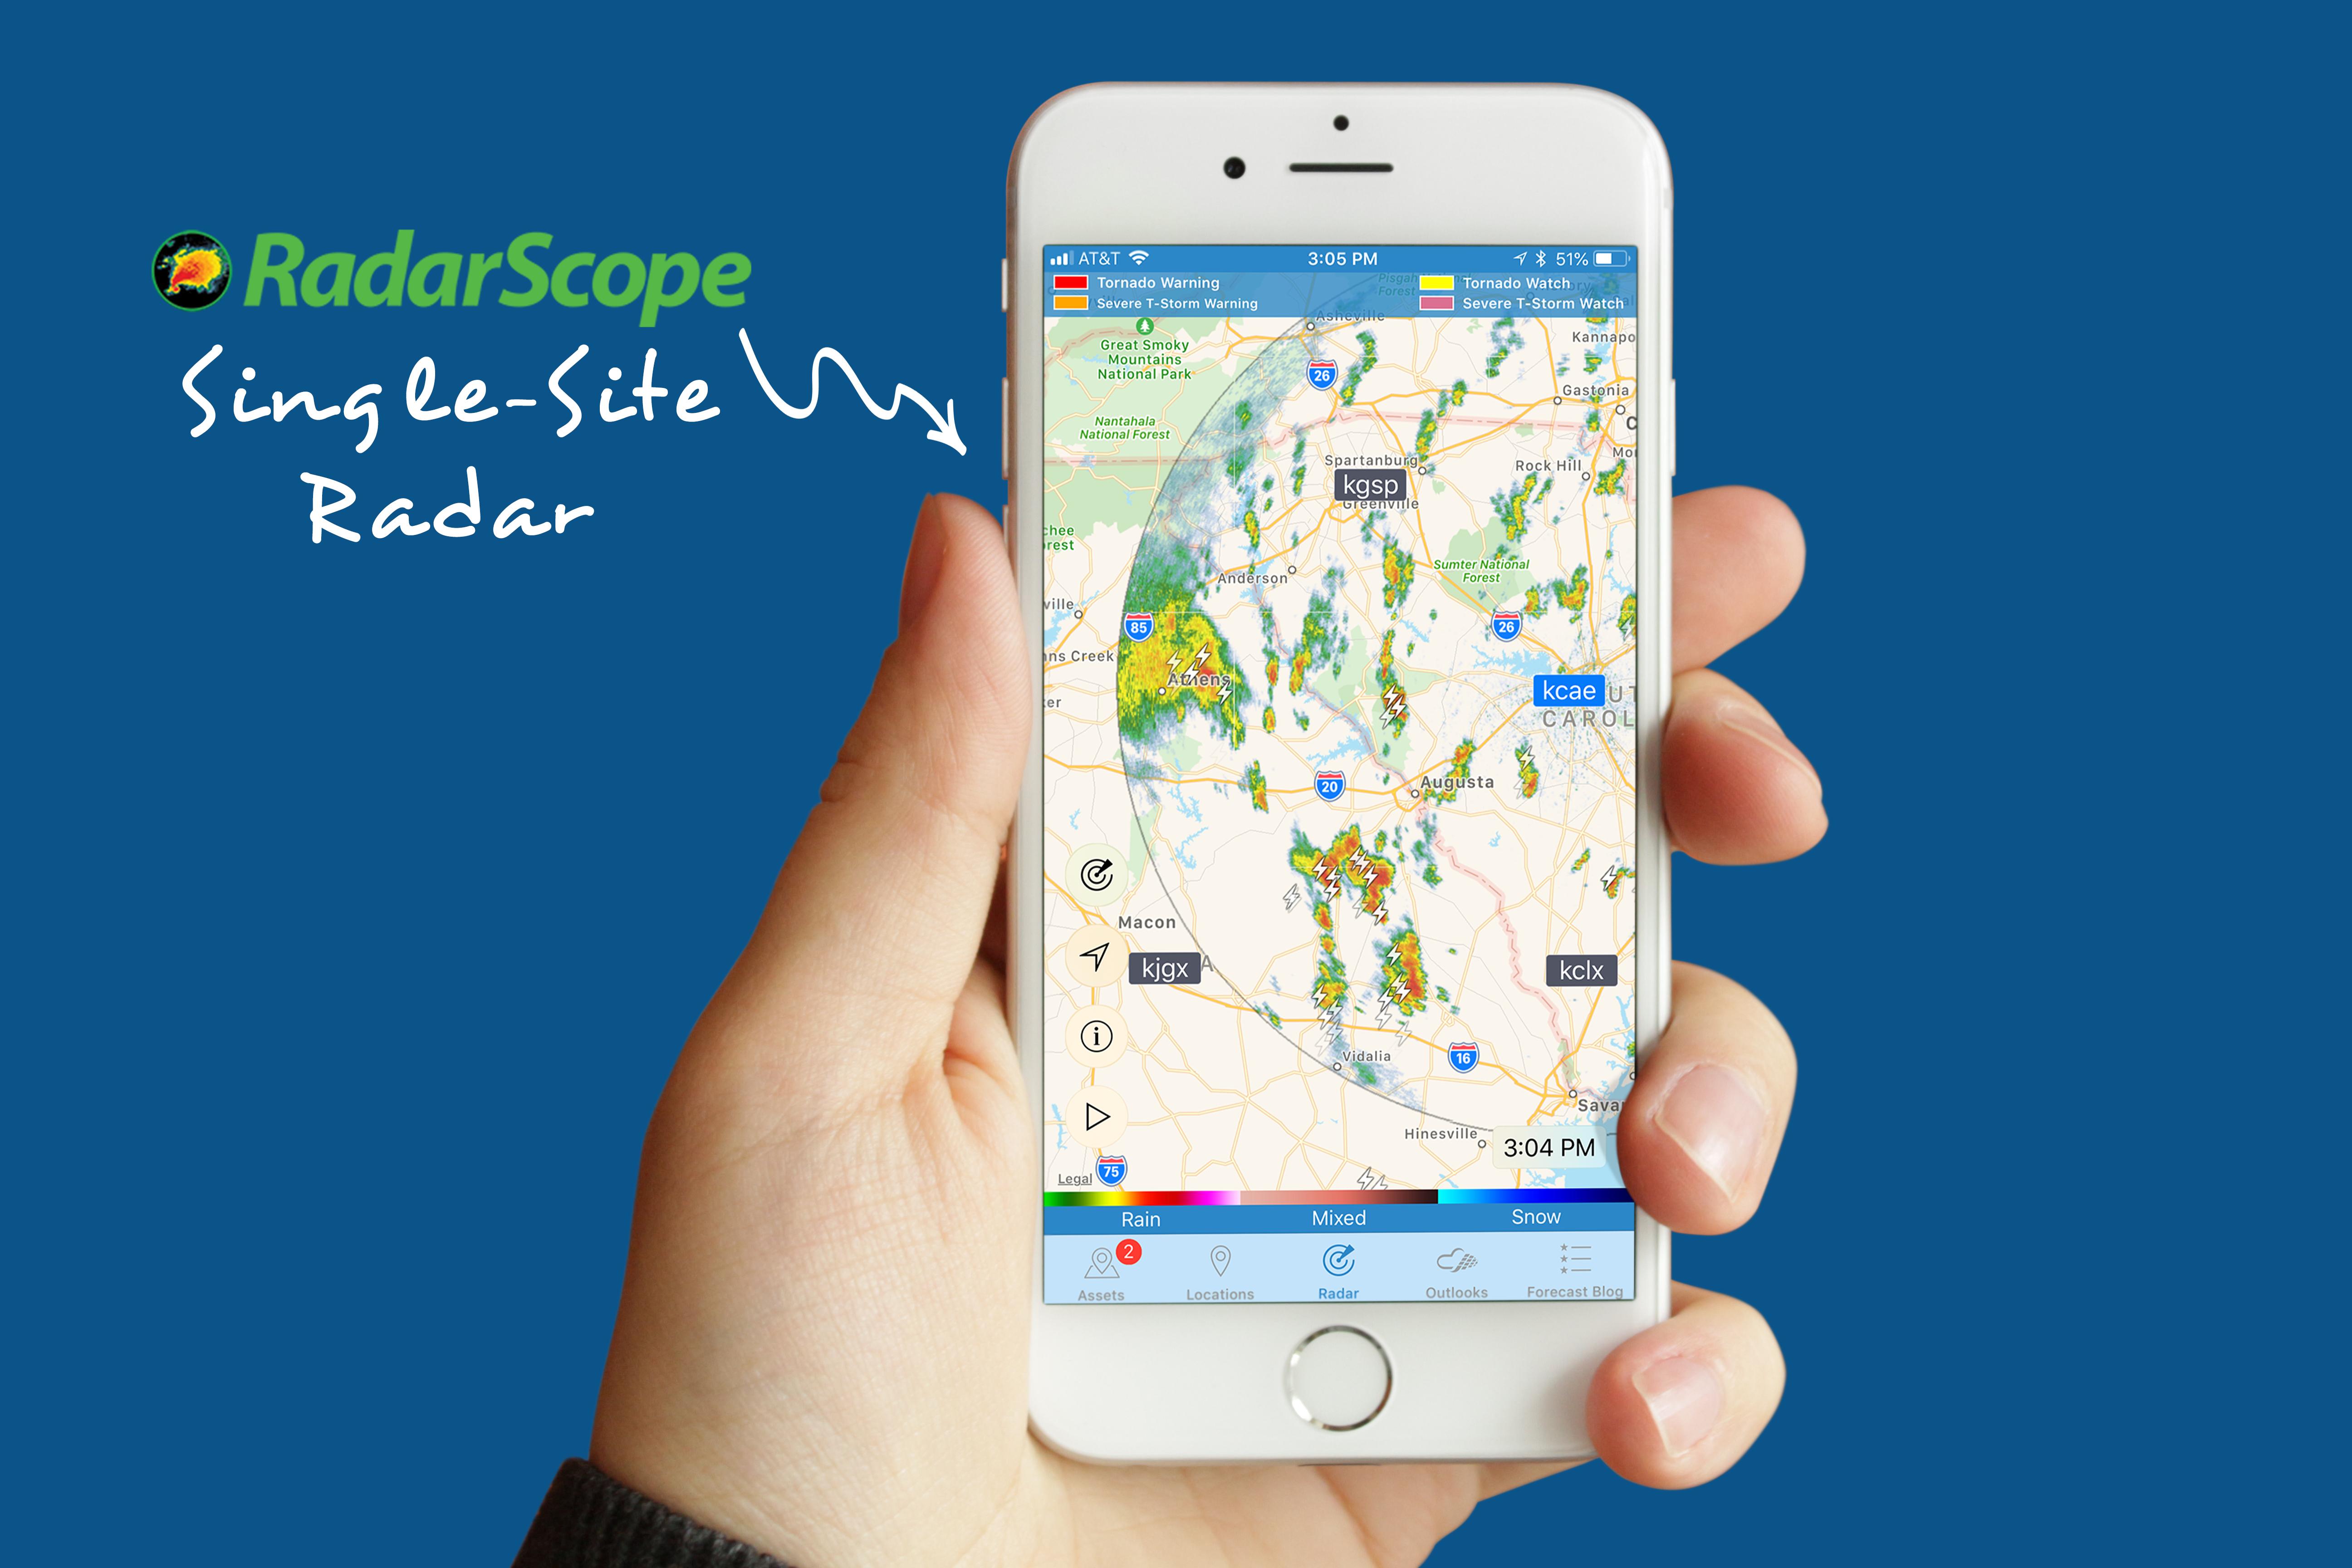 WeatherOps Mobile App to Have RadarScope Single-Site Radar